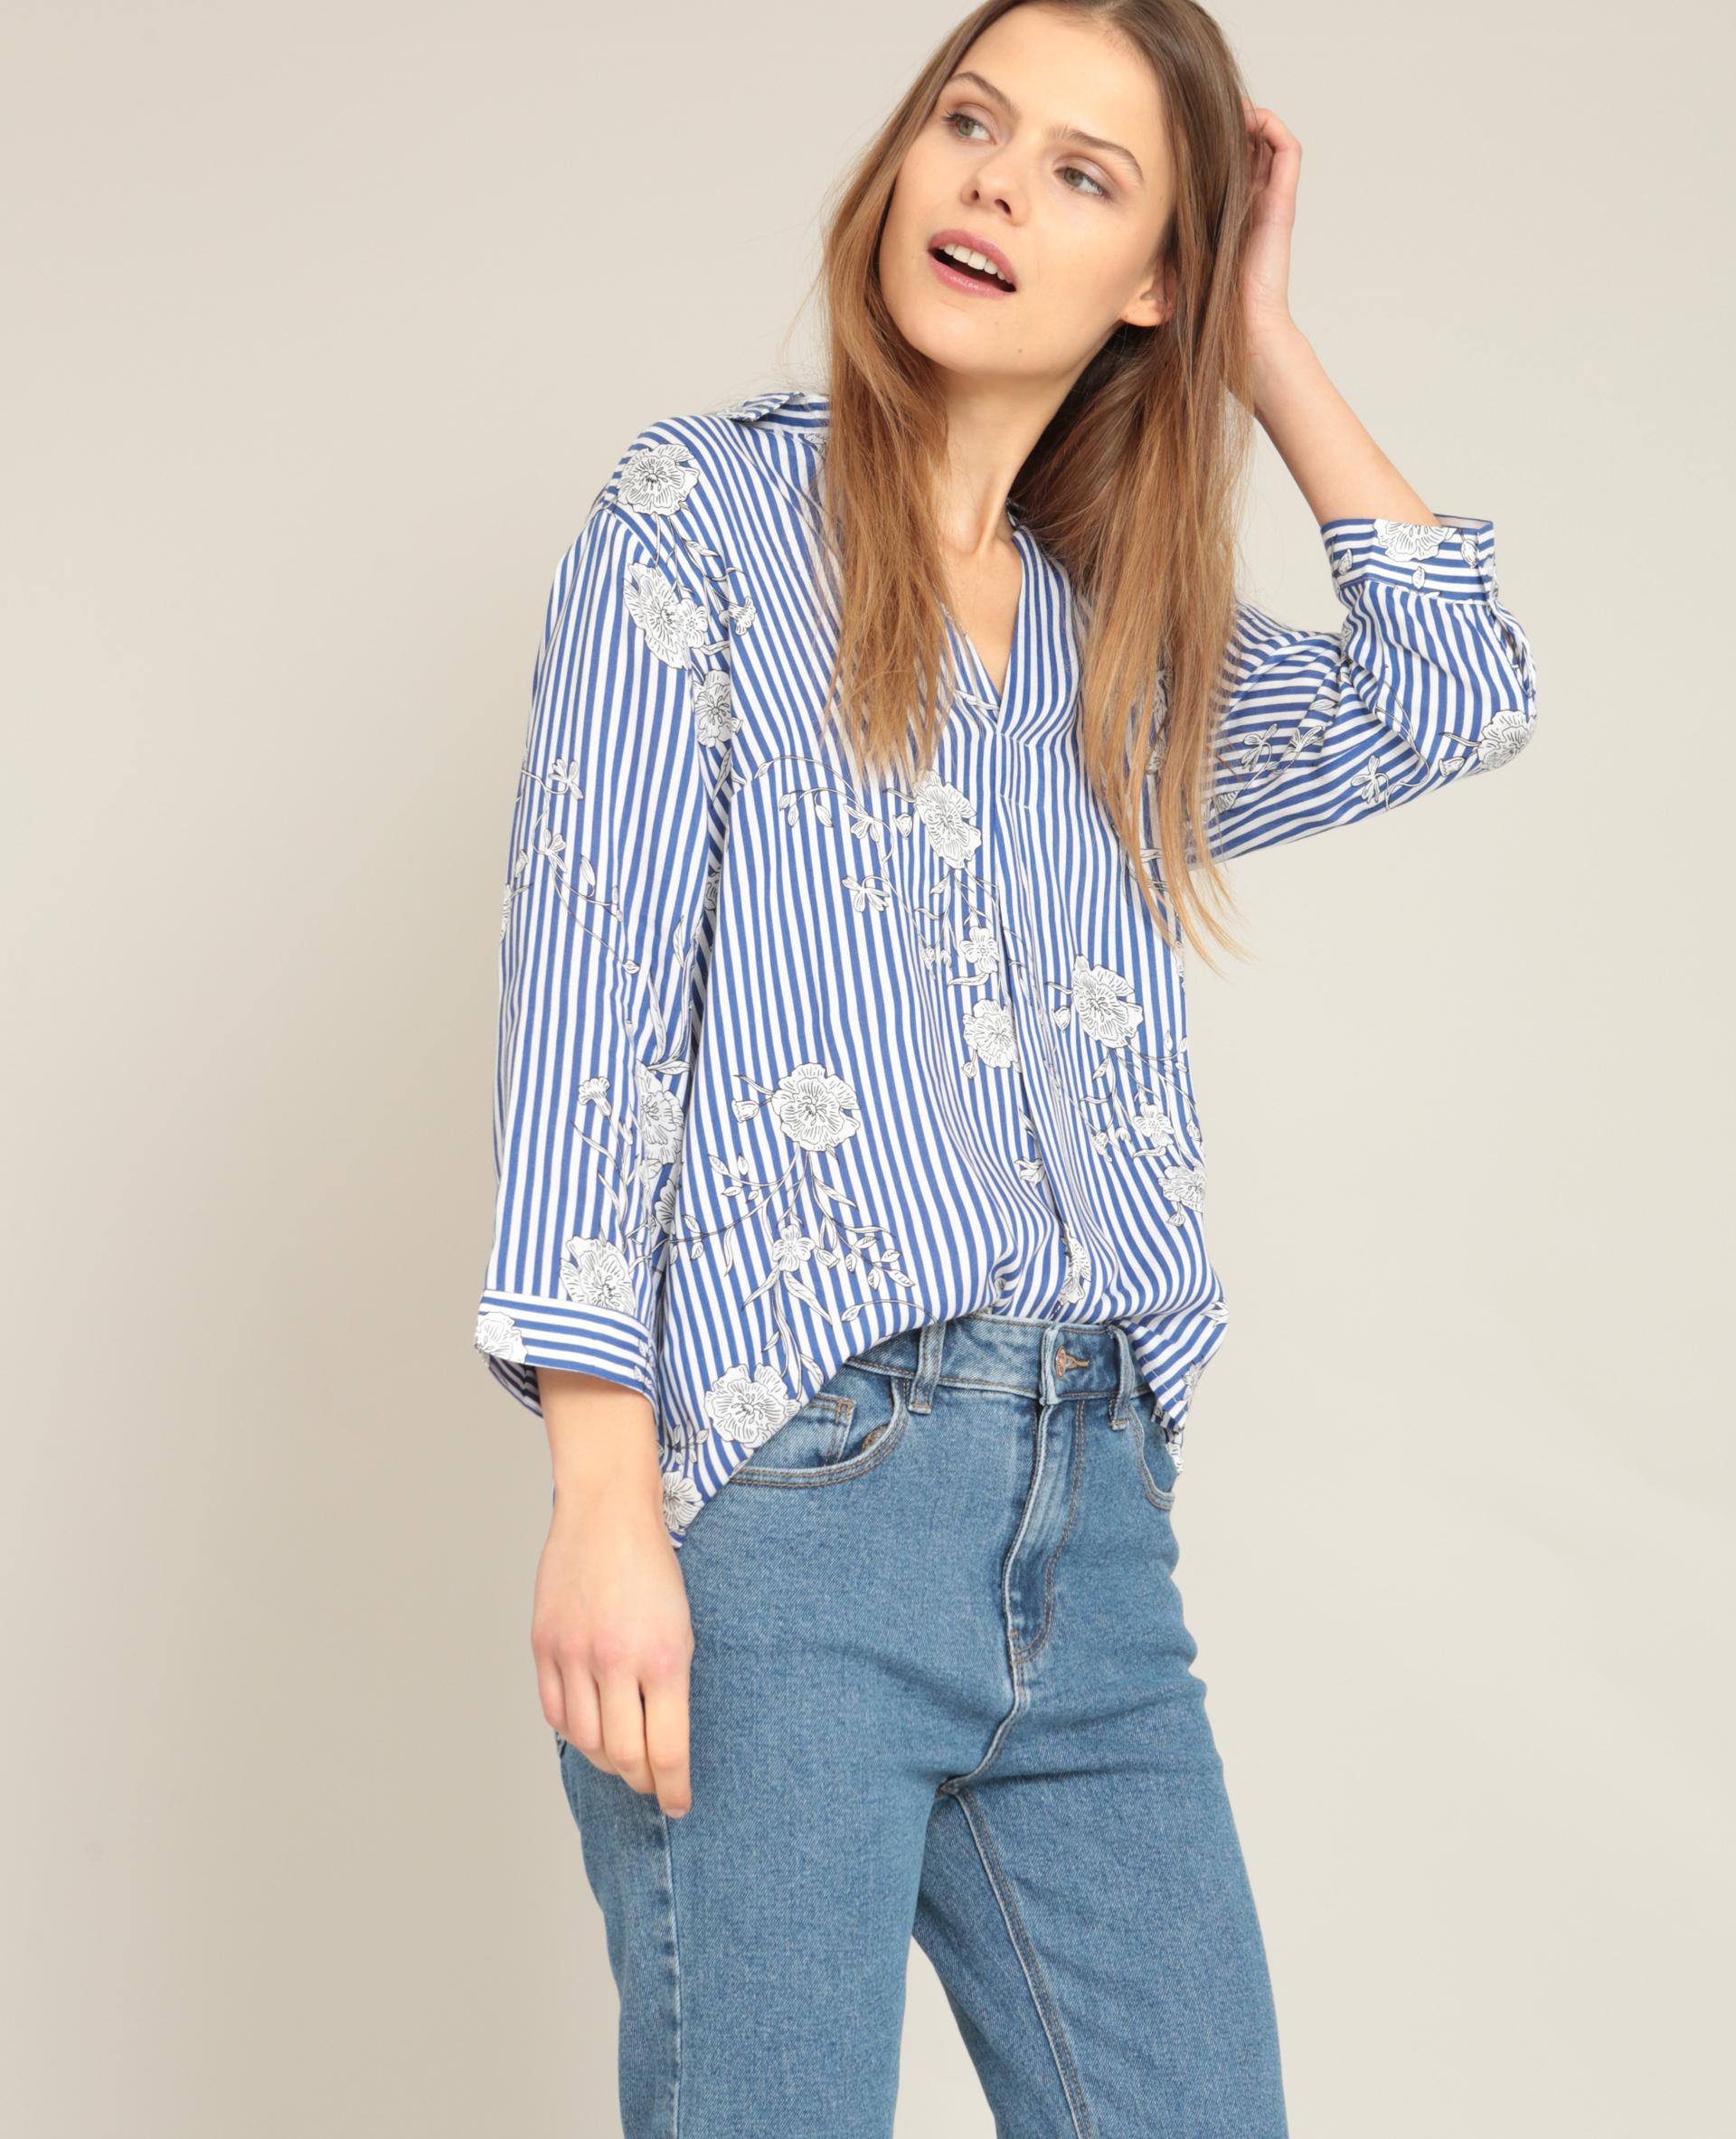 Chemise Jean Longue avec chemise femme | pimkie